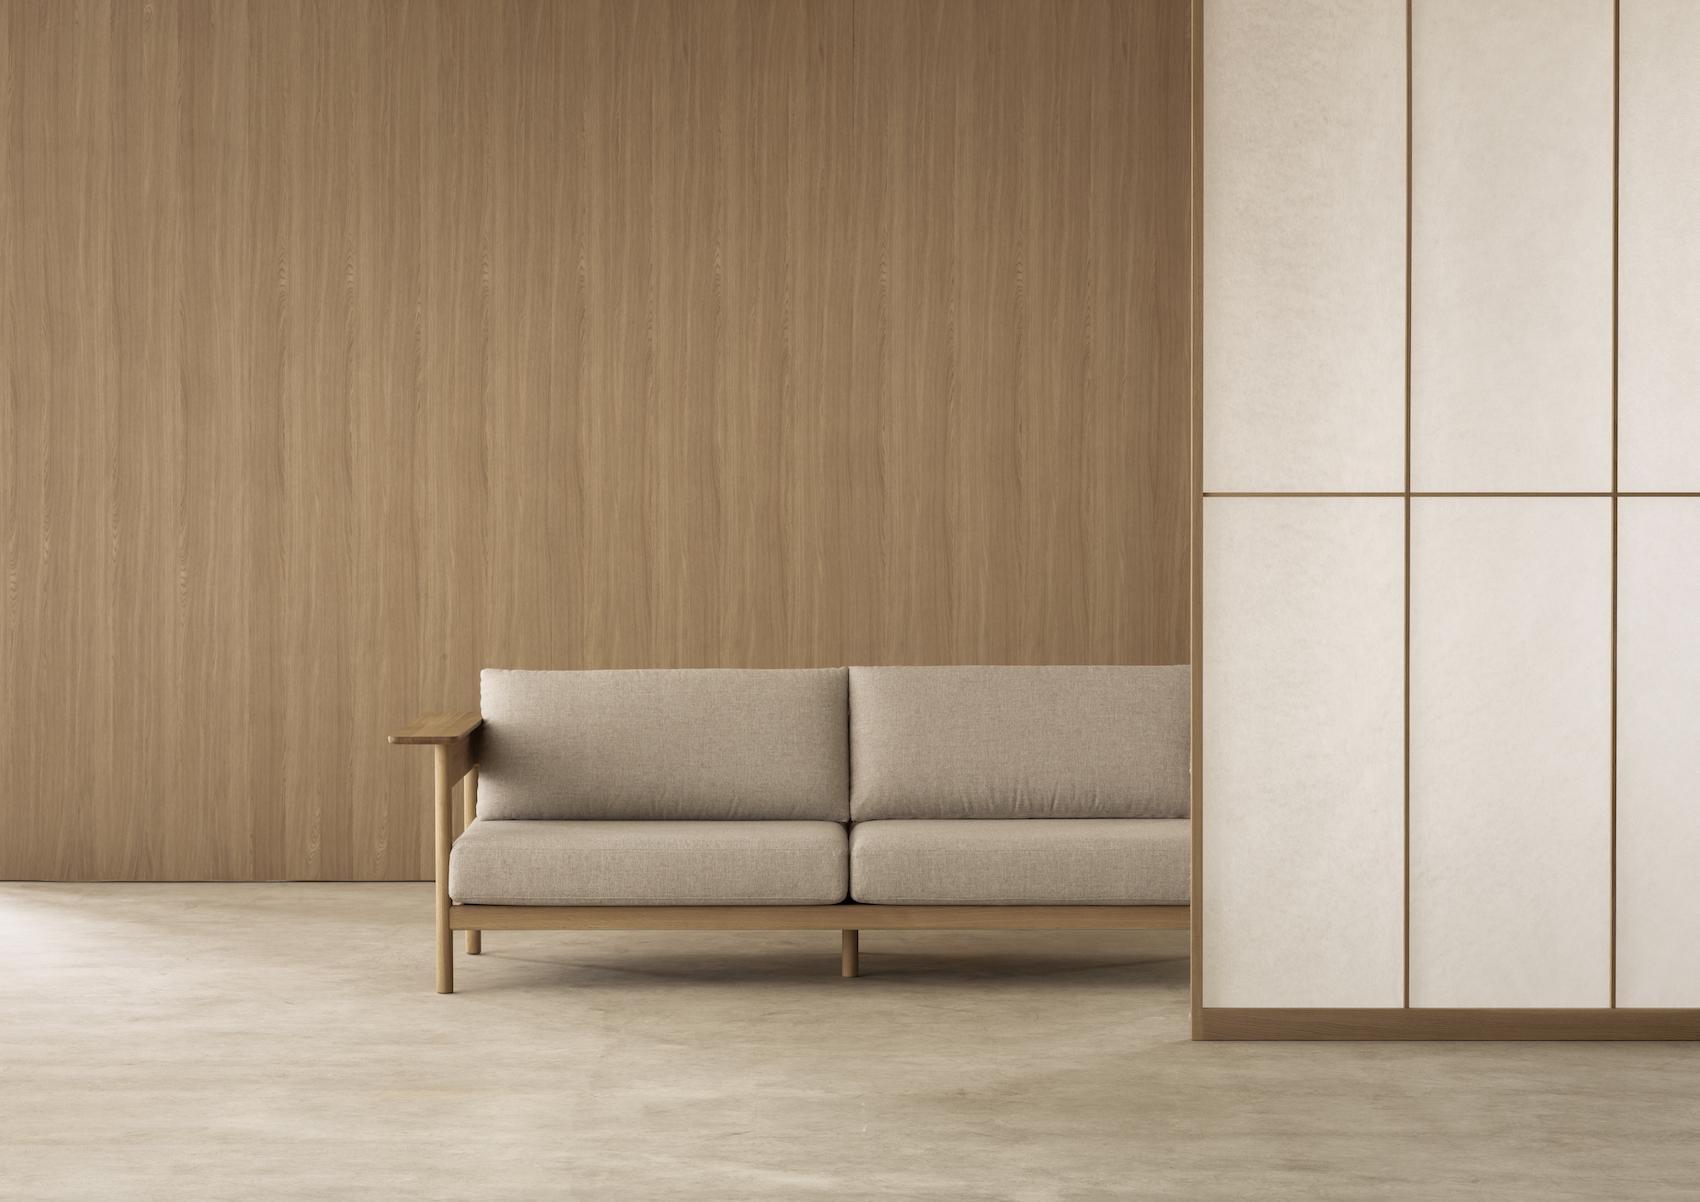 Minimalist Sofa Kinuta N-S01 by Norm Architects